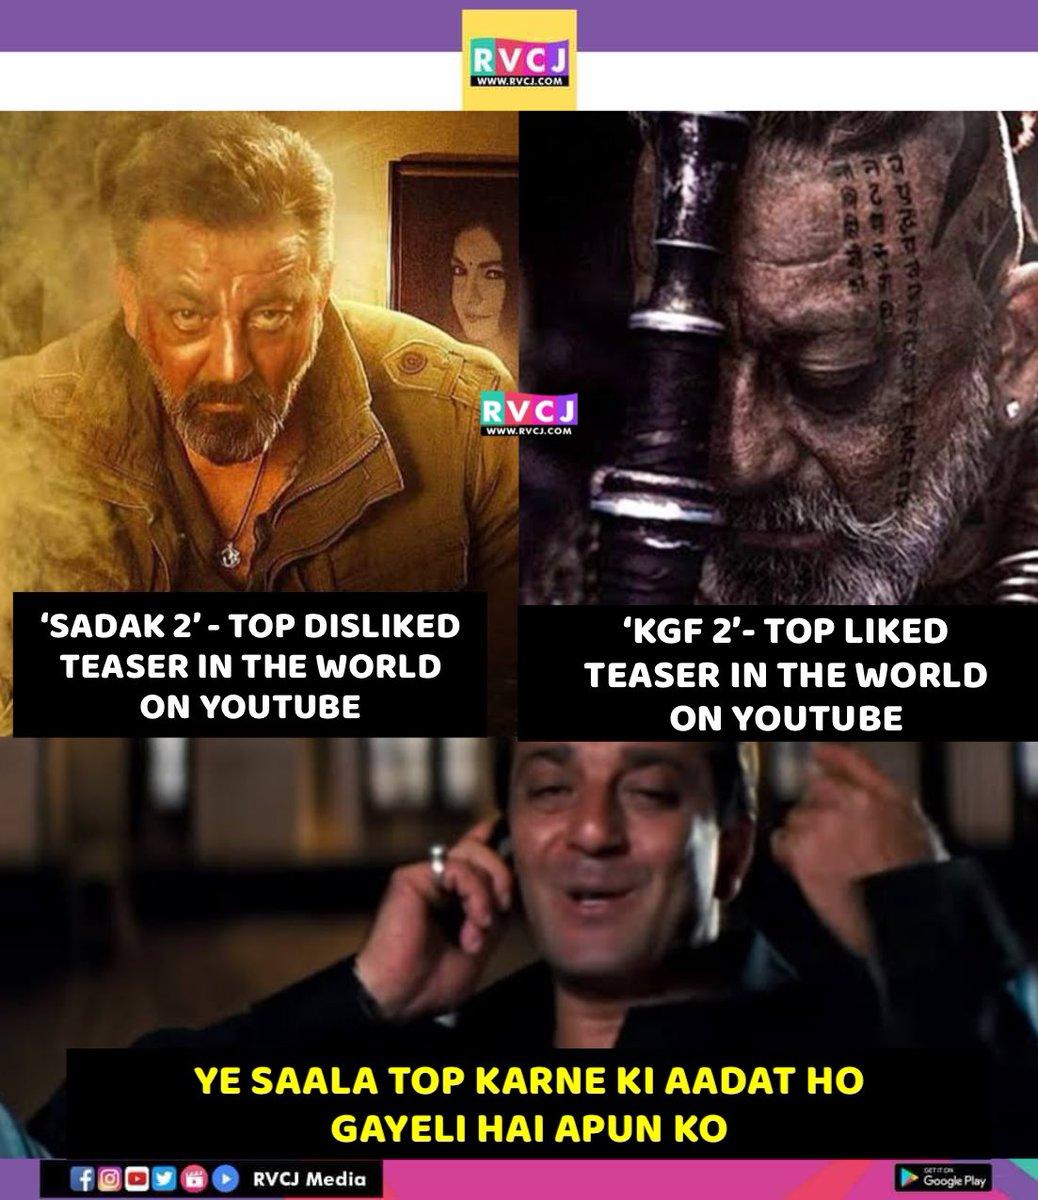 He is part of both movies 😆 @duttsanjay  #sanjaydutt #sadak2 #kgf #kgf2 #kgfchapter2 #bollywood #actor #rvcjmovies